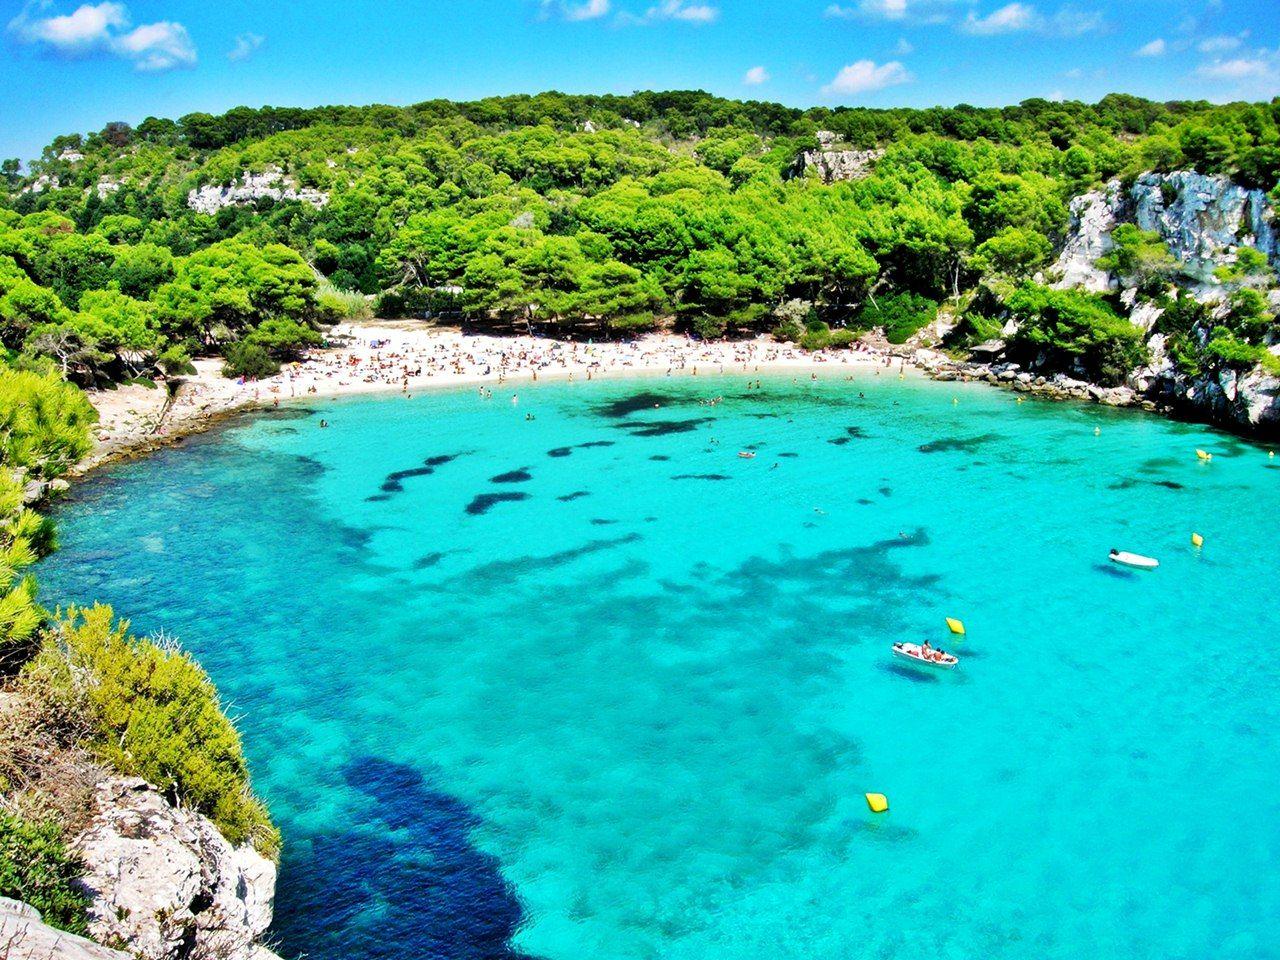 Minorca, Spain Isole baleari, Minorca, Vacanze